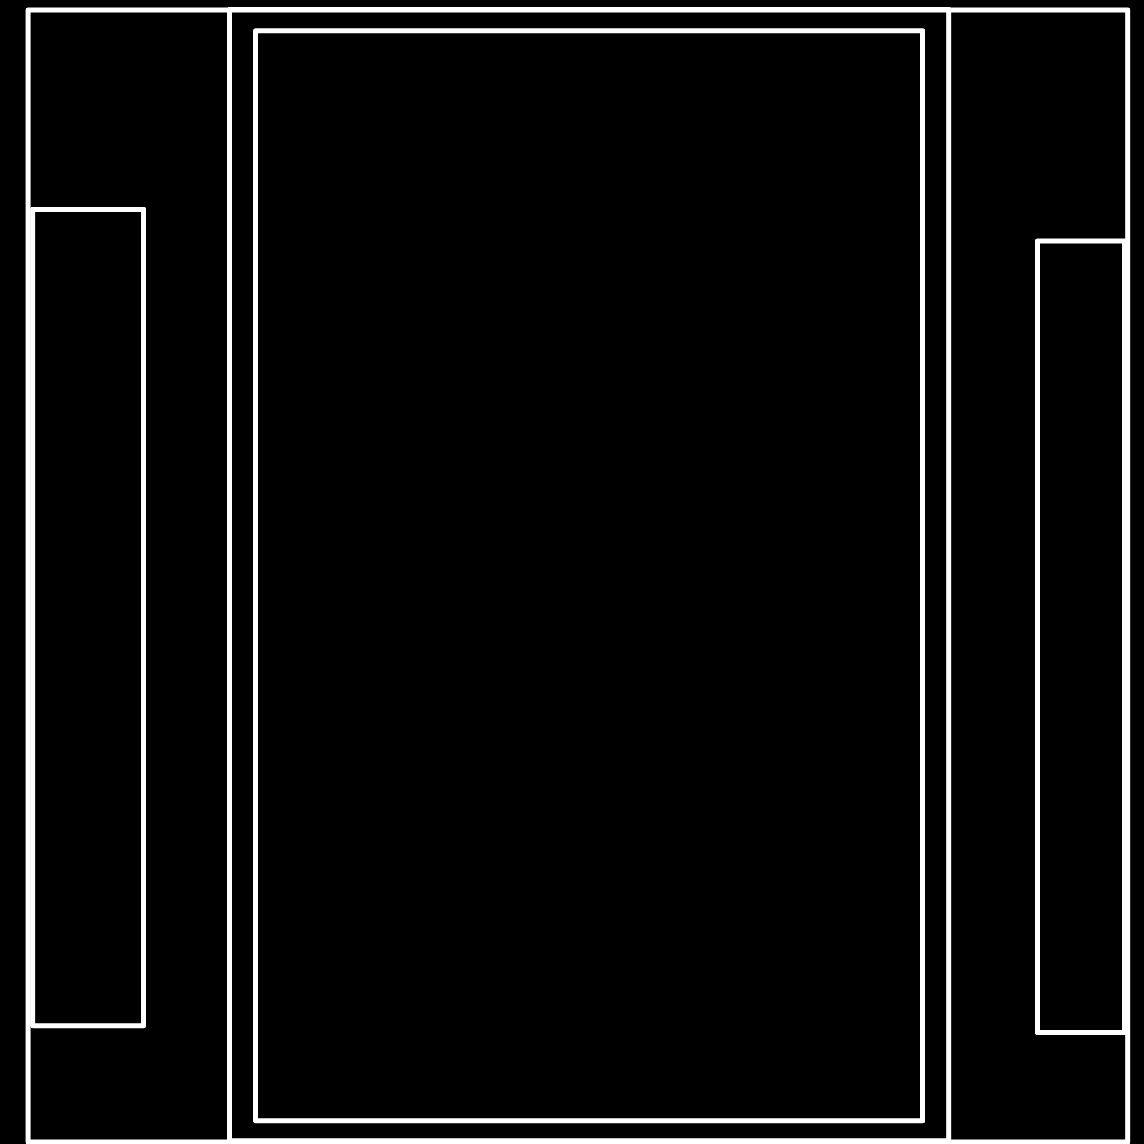 Latest Png Lines Overlays Picsart Page Borders Design Picsart Png